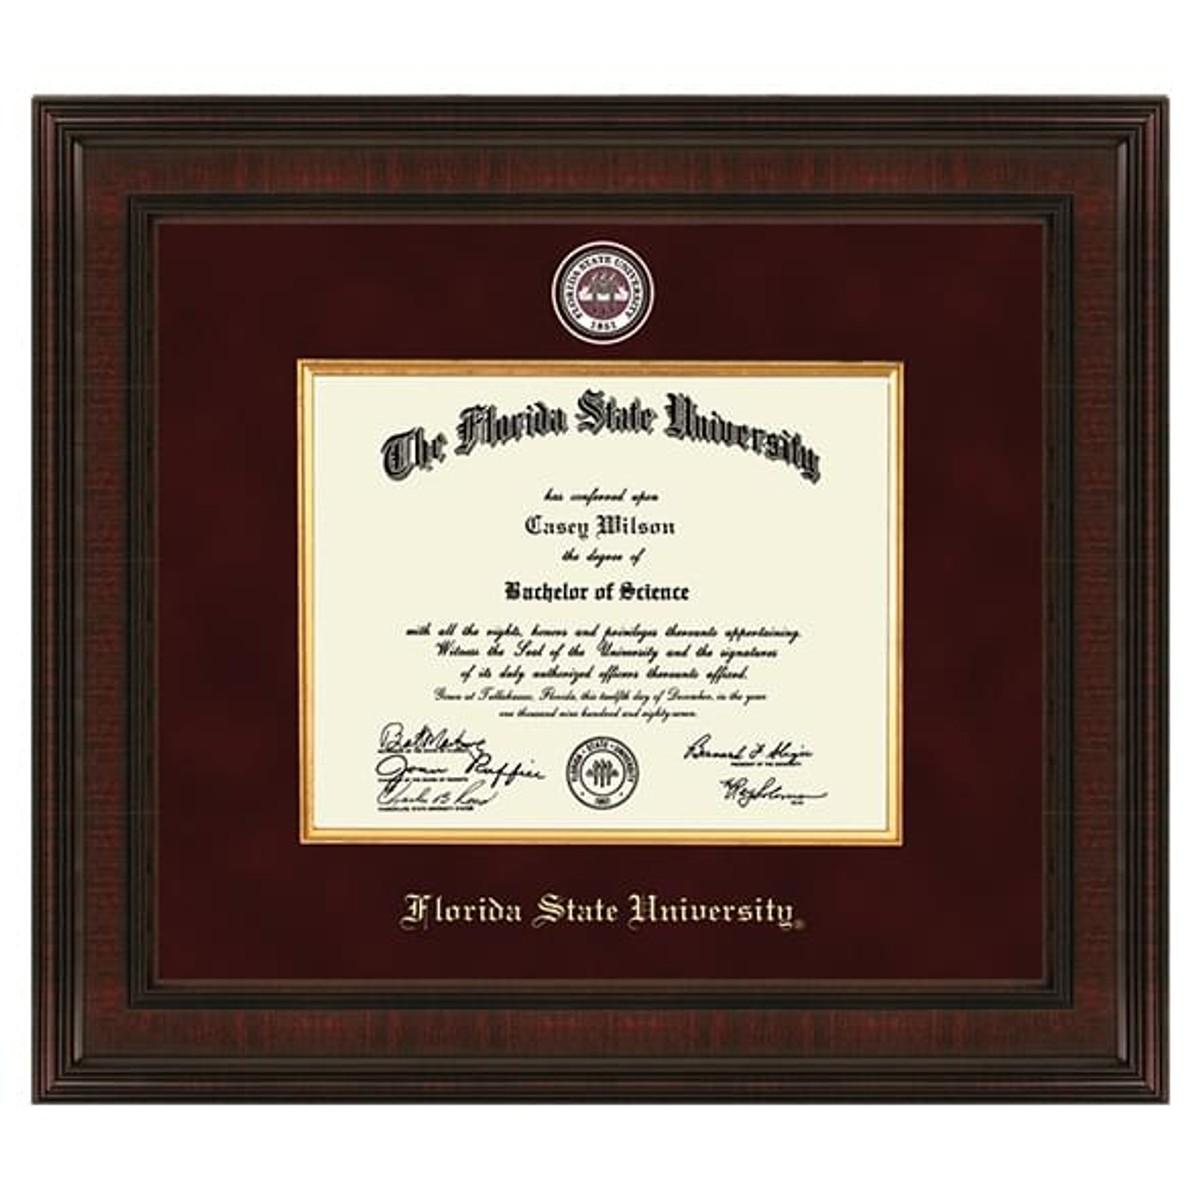 Florida State University Diploma Frame Excelsior